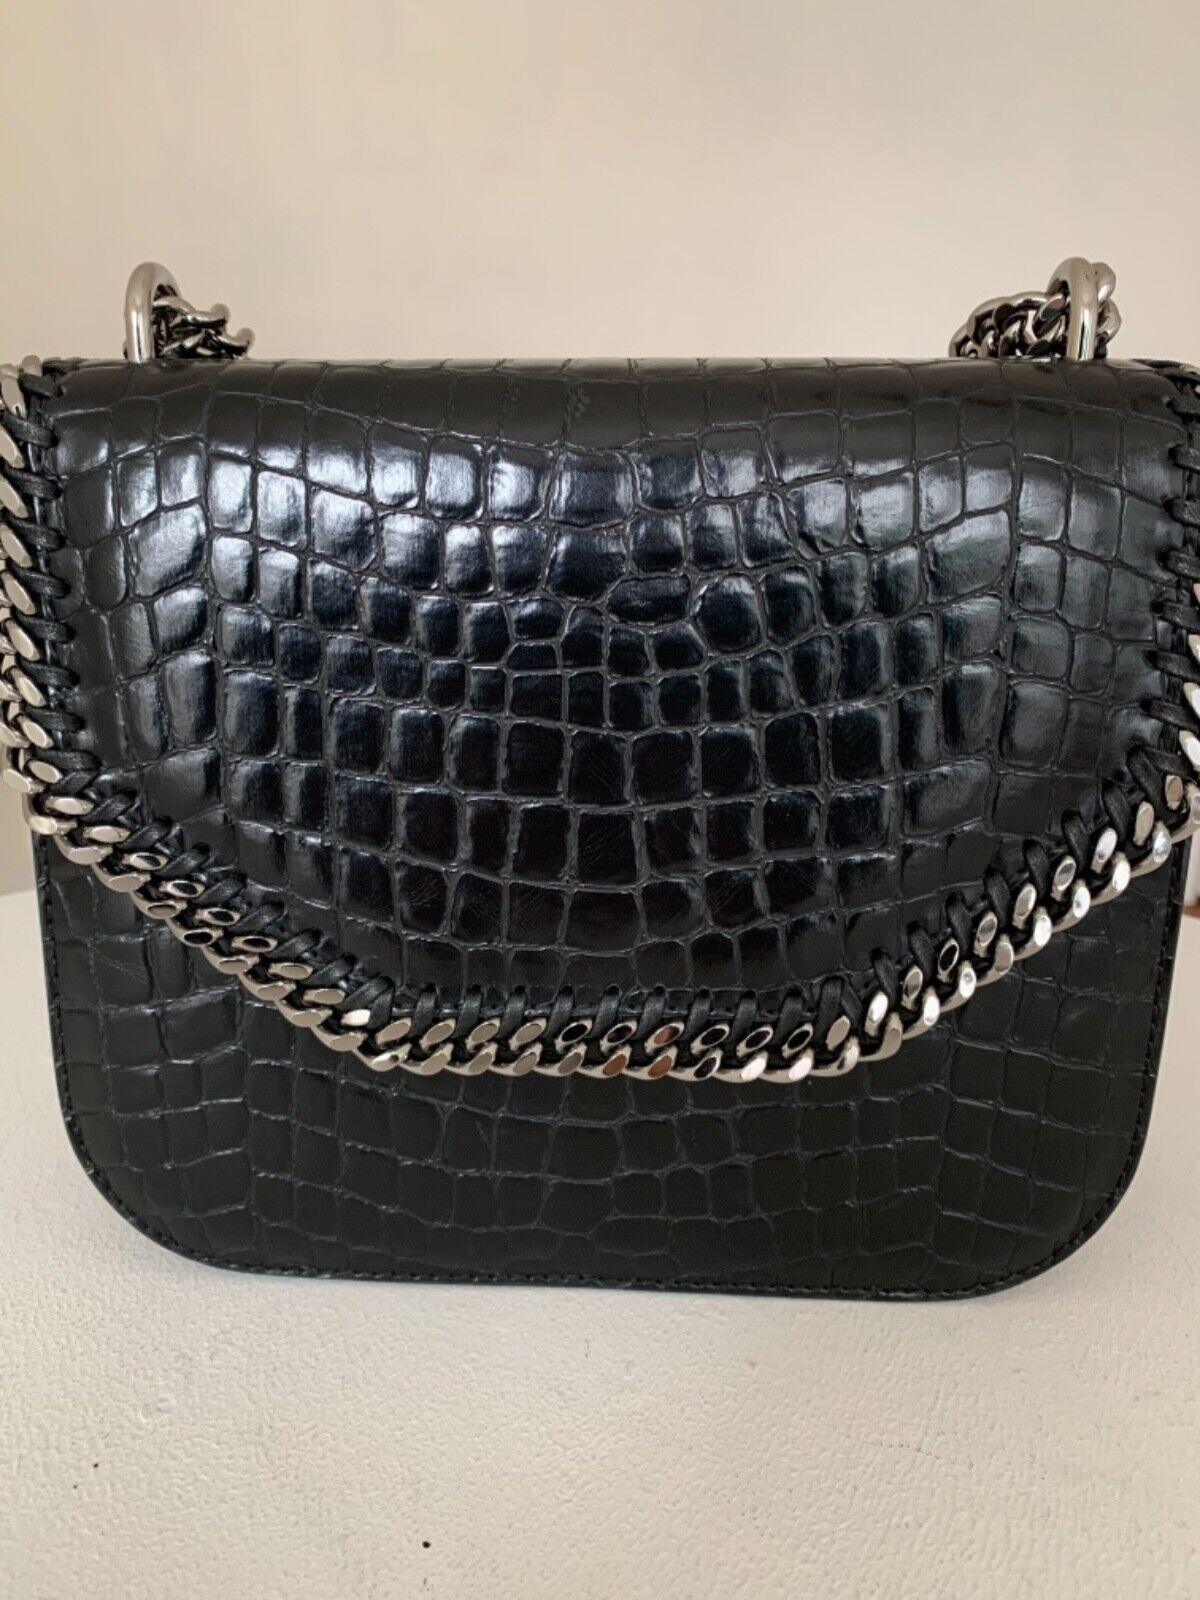 Stella Mccartney Fallabella Studded Croco Embossed Leather Shoulder Bag